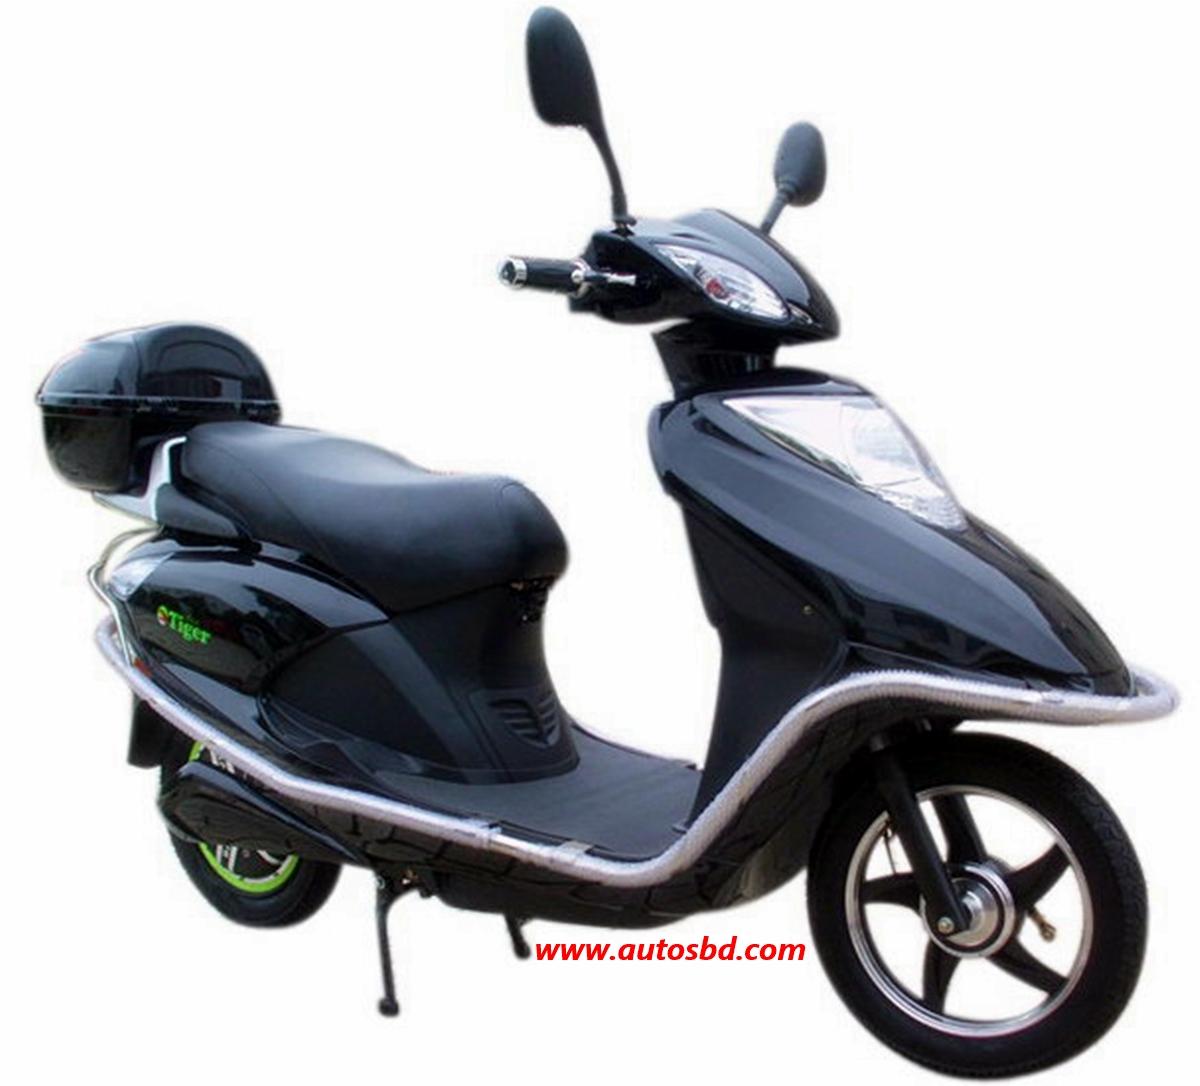 Green Tiger Digital-300 Motorcycle Specification